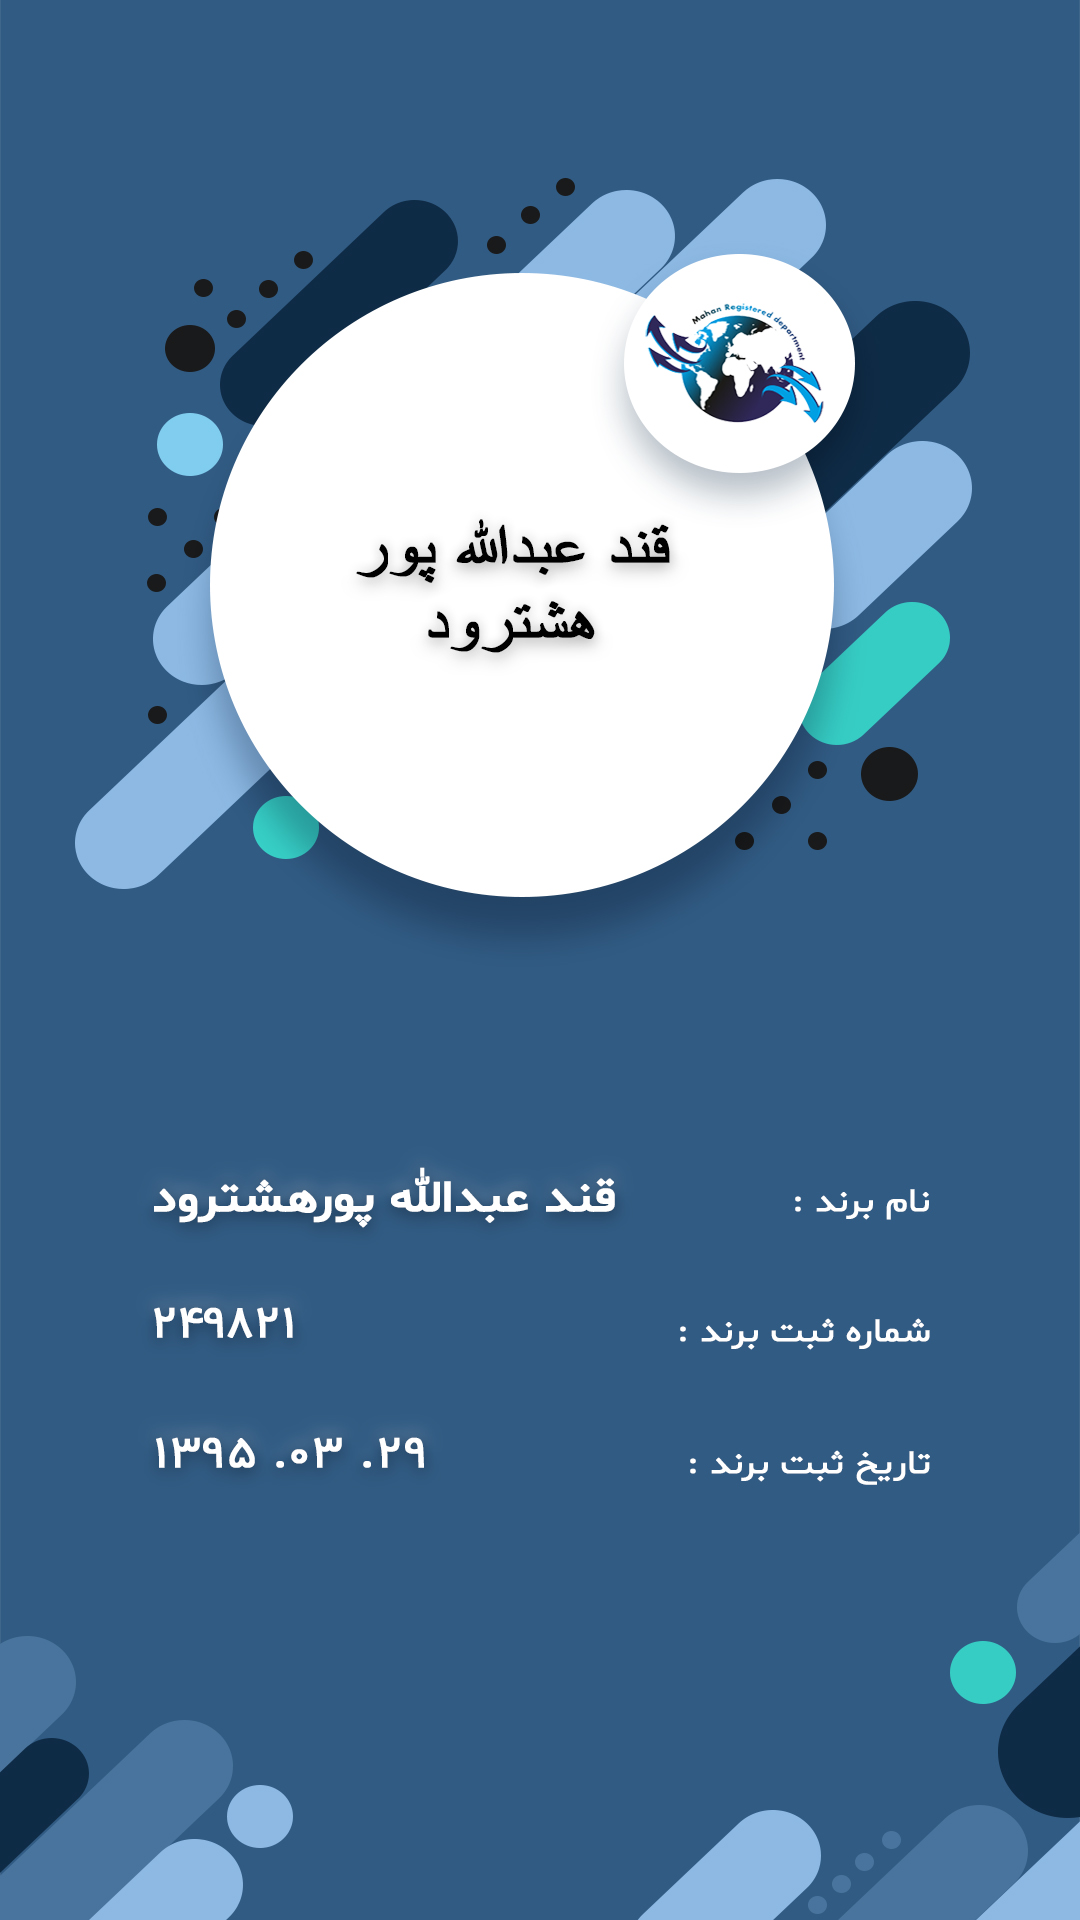 Mahan-Story-br-15-24899